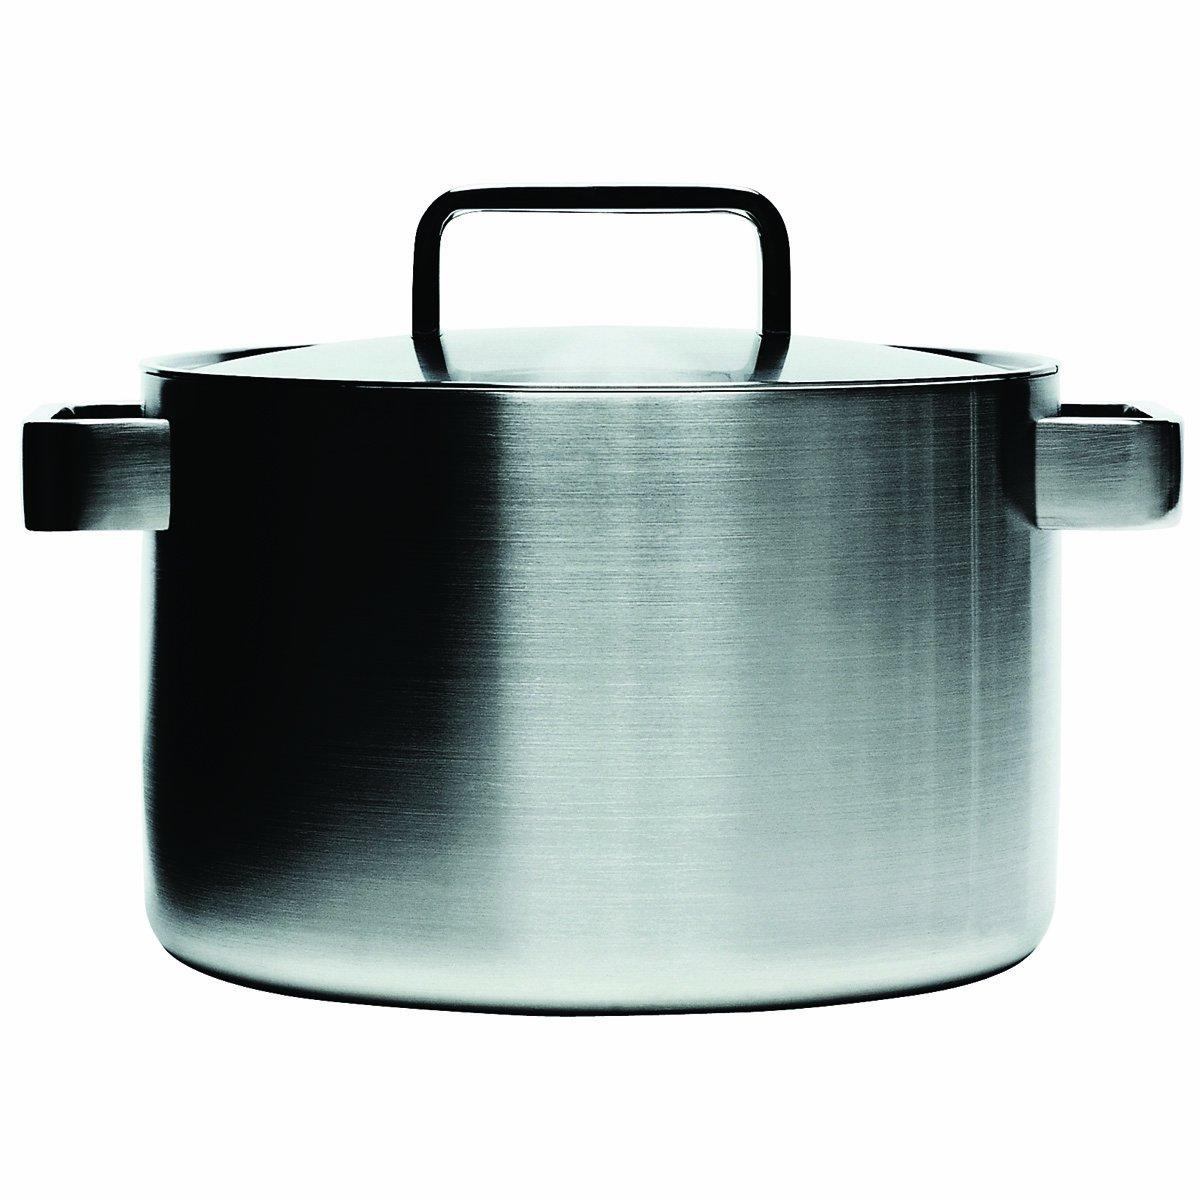 Iittala Töpfe iittala 162652 tools topf mit deckel 8 liter amazon de küche